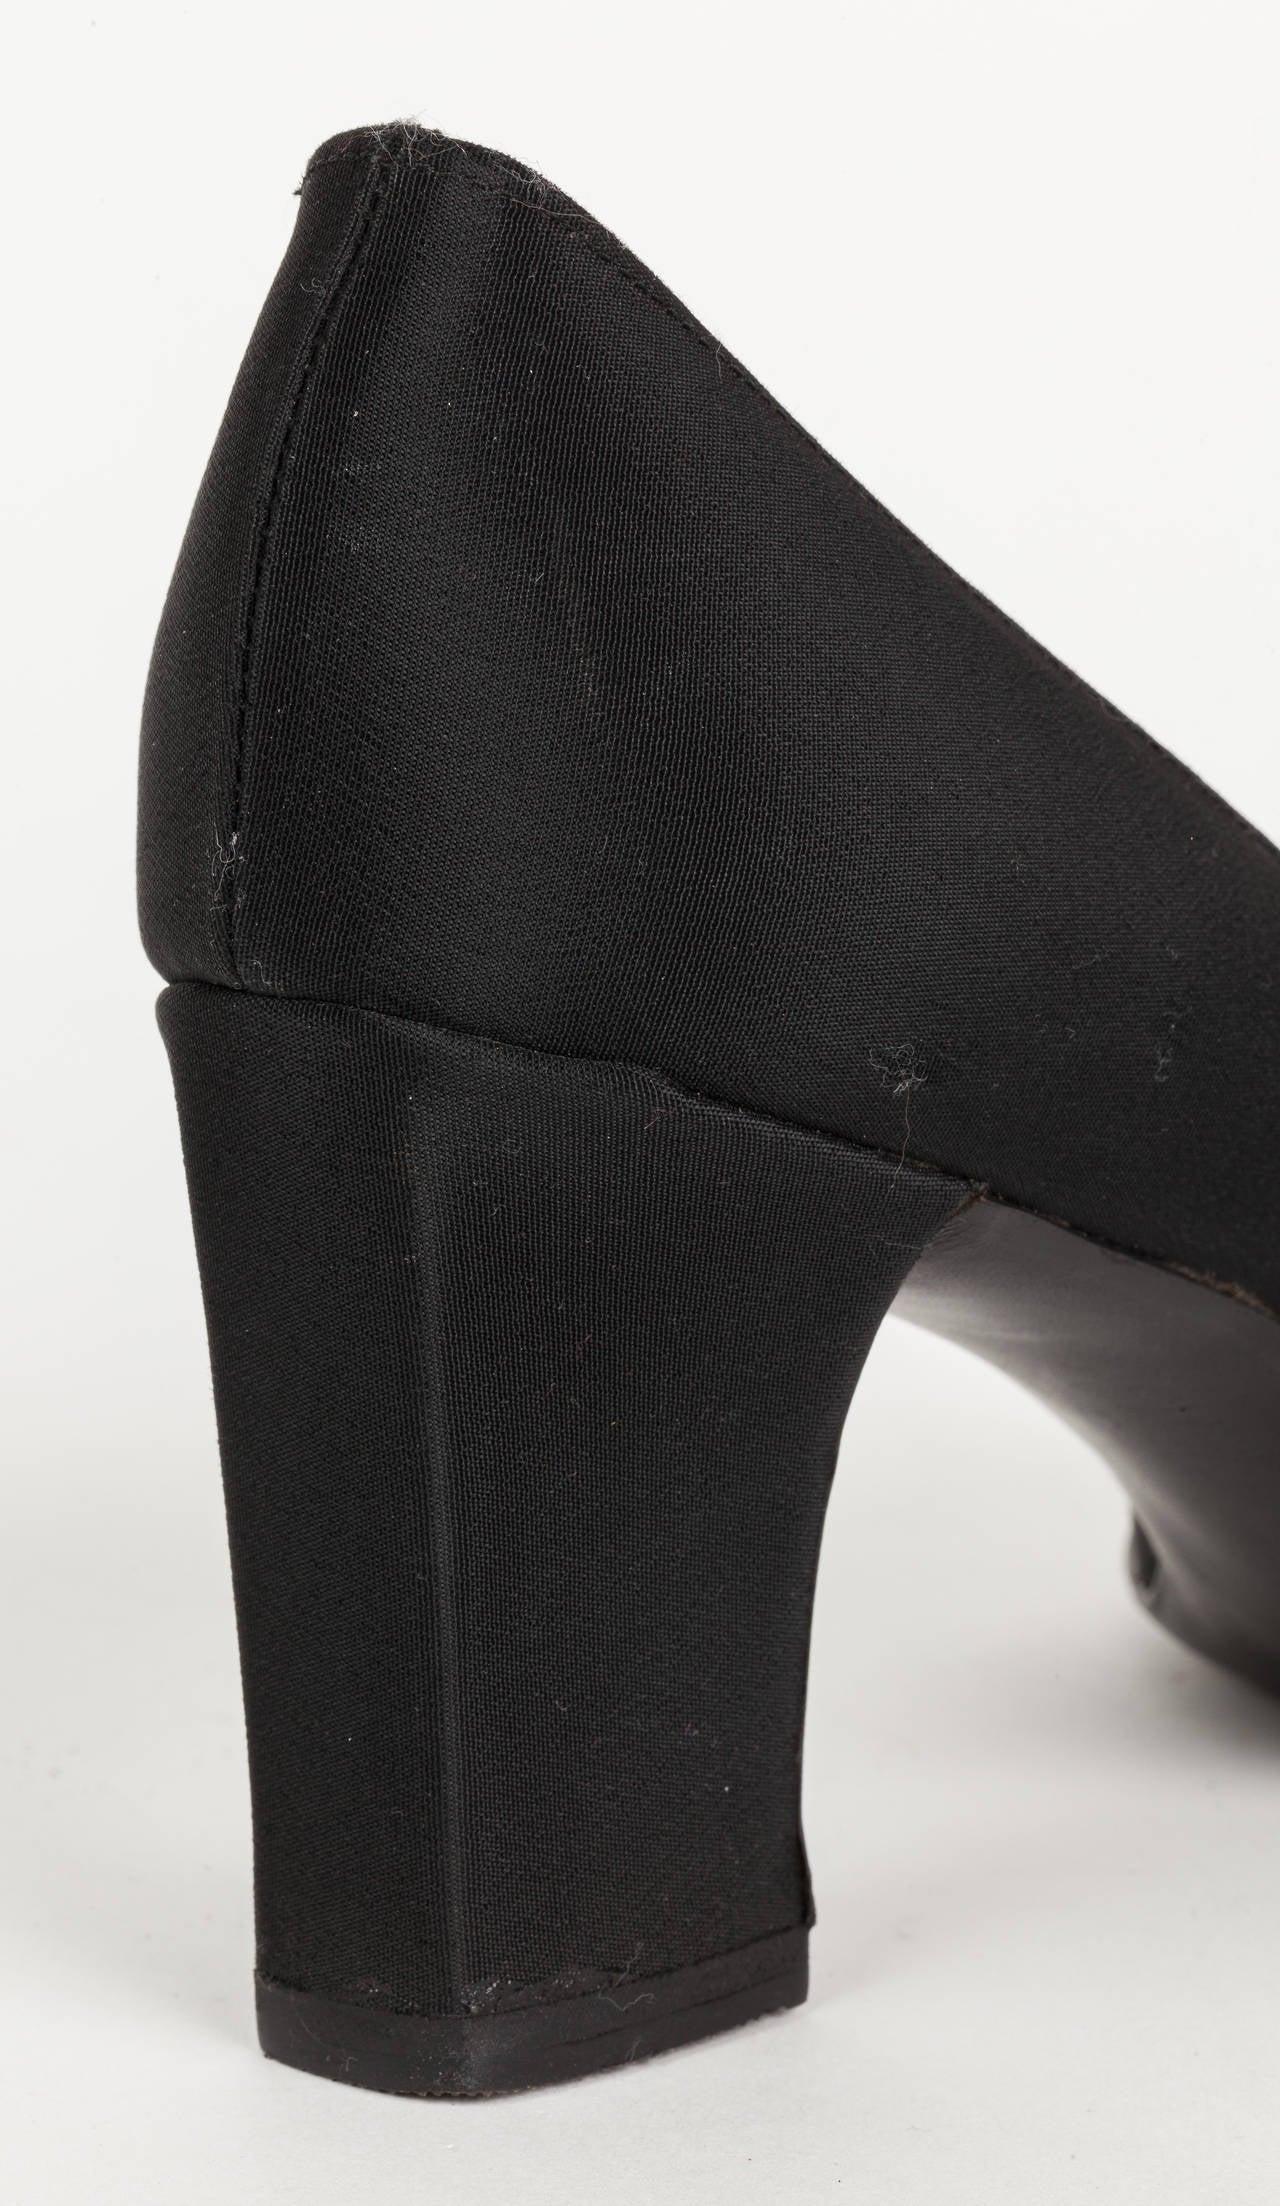 Vintage Pierre Cardin Paris Silky Pumps High Heels W